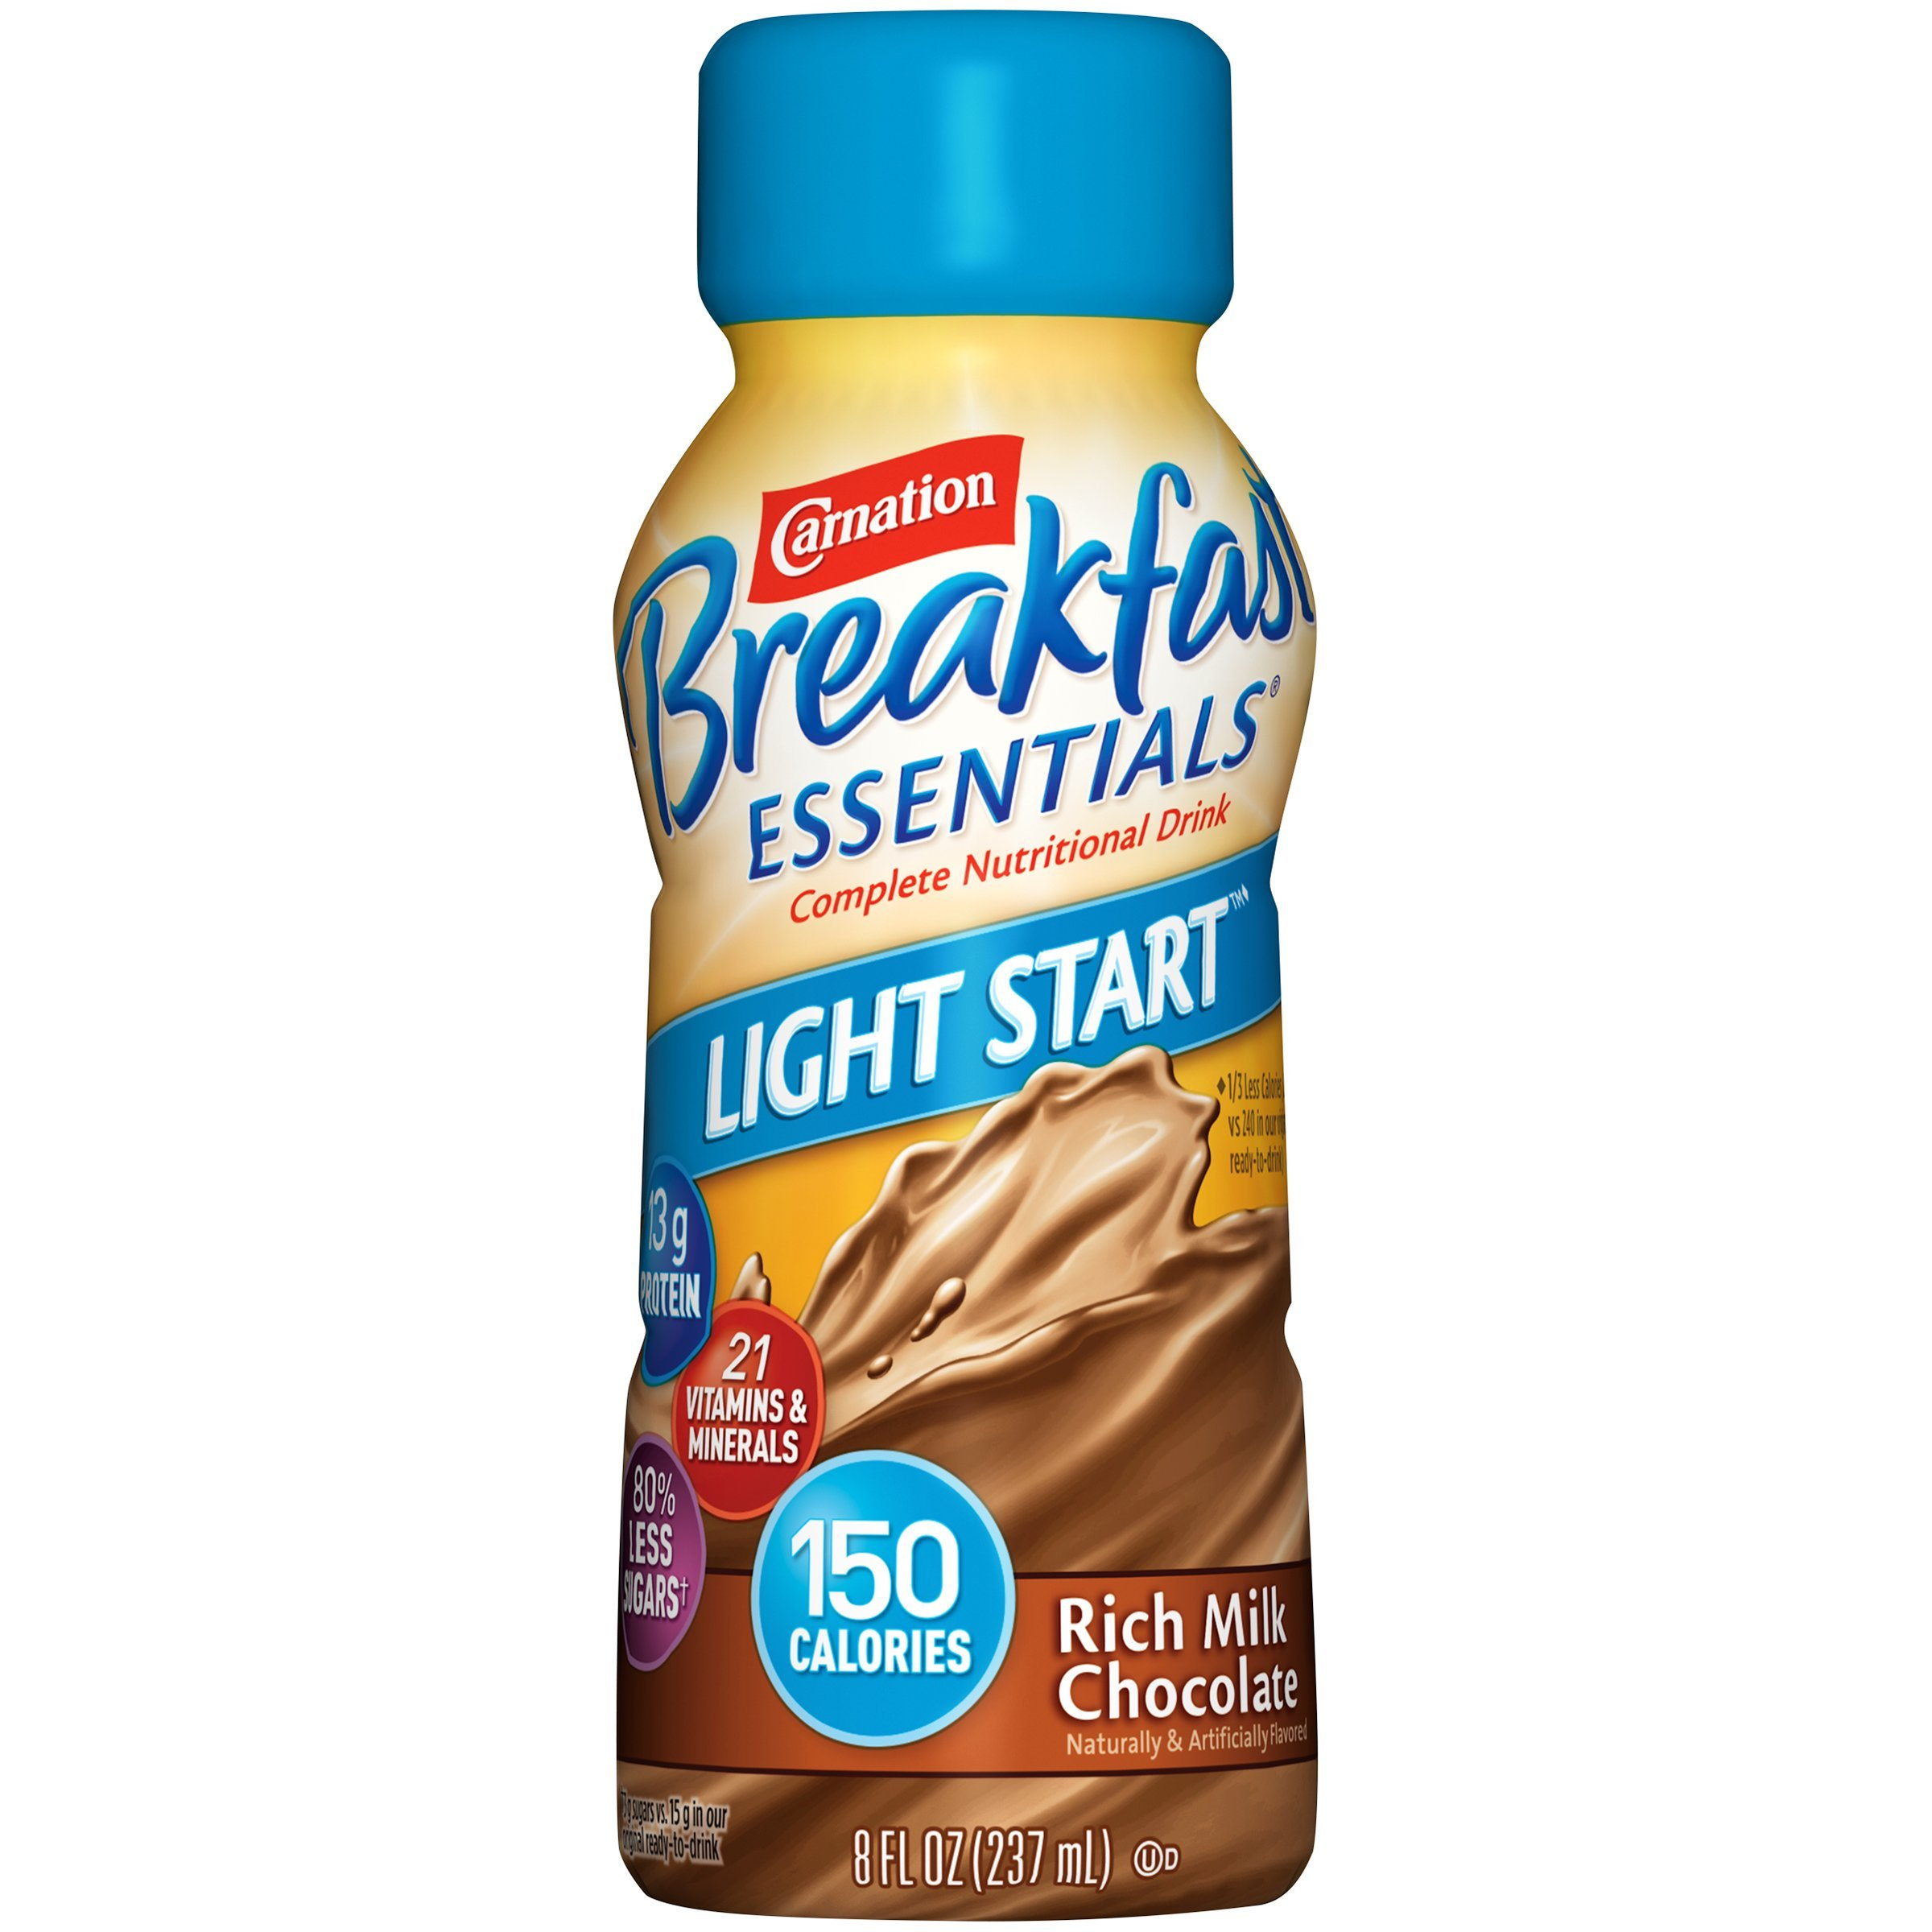 Amazon Com Boost Original Complete Nutritional Drink: Amazon.com : Carnation Breakfast Essentials Complete Light